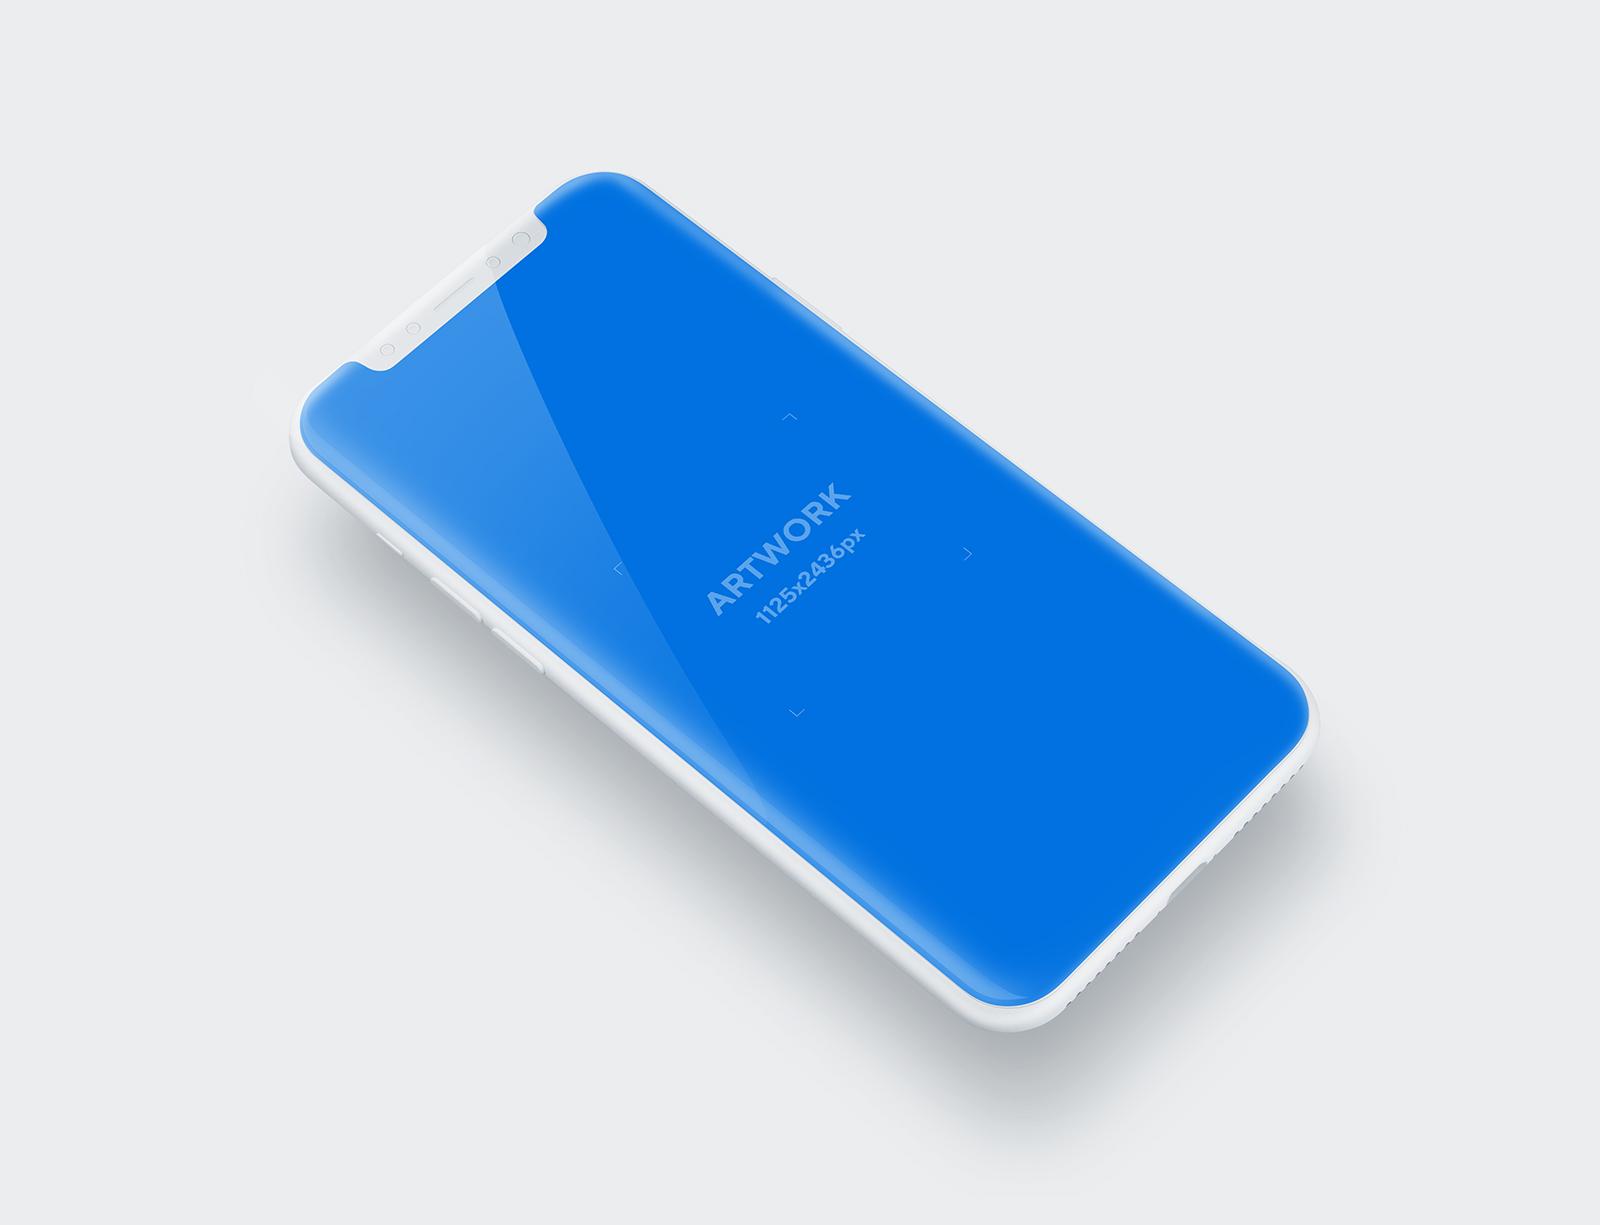 iPhone X/11 Pro Free PSD Mockup